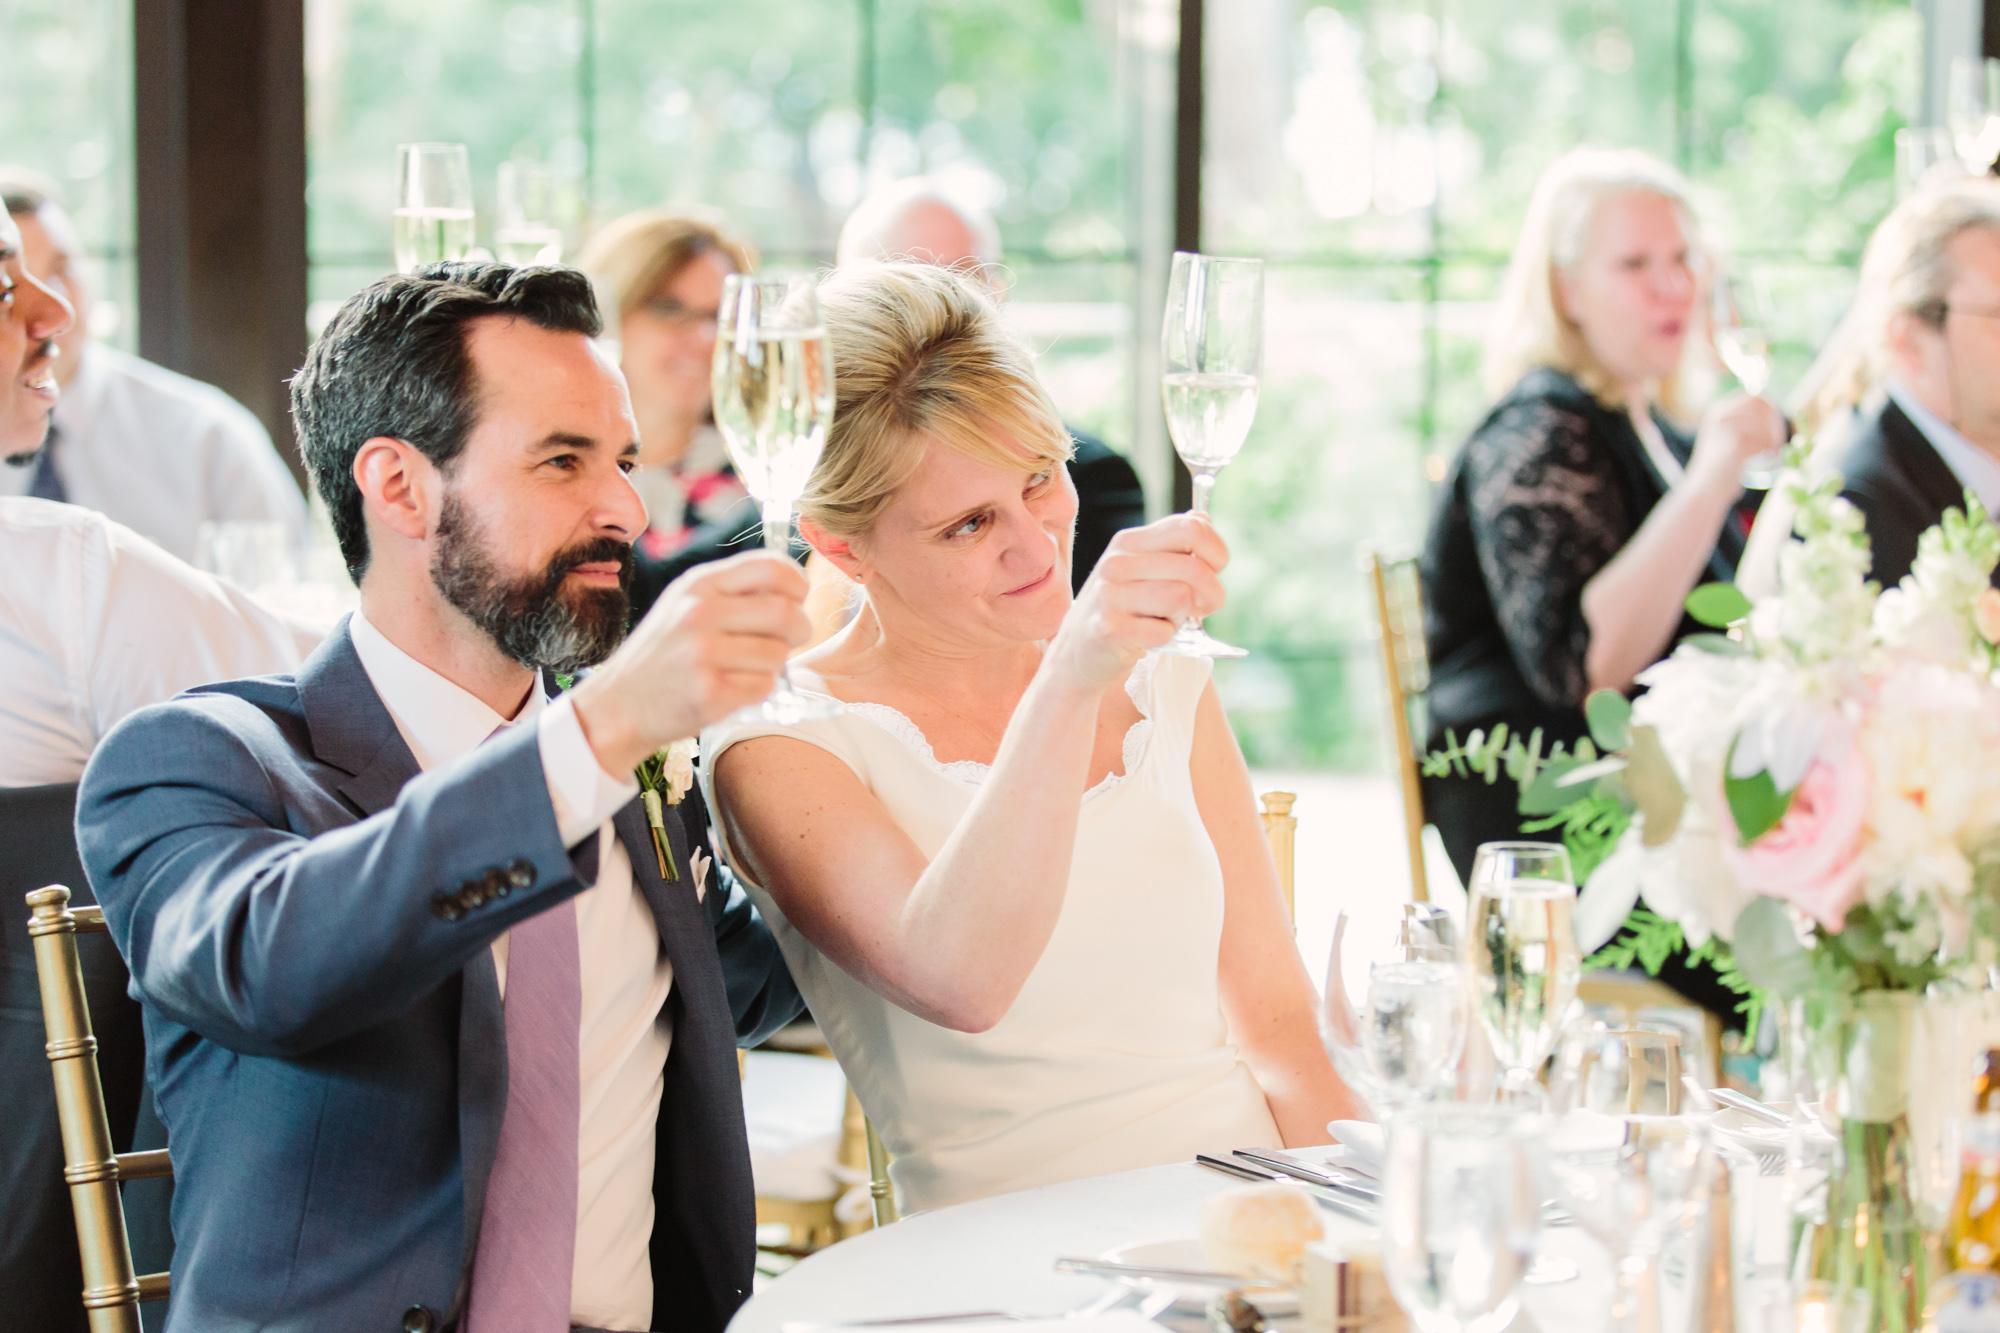 70_Rowan_Brian_The_Roundhouse_Wedding_Beacon_NY_Tanya_Salazar_Photography_754.jpg